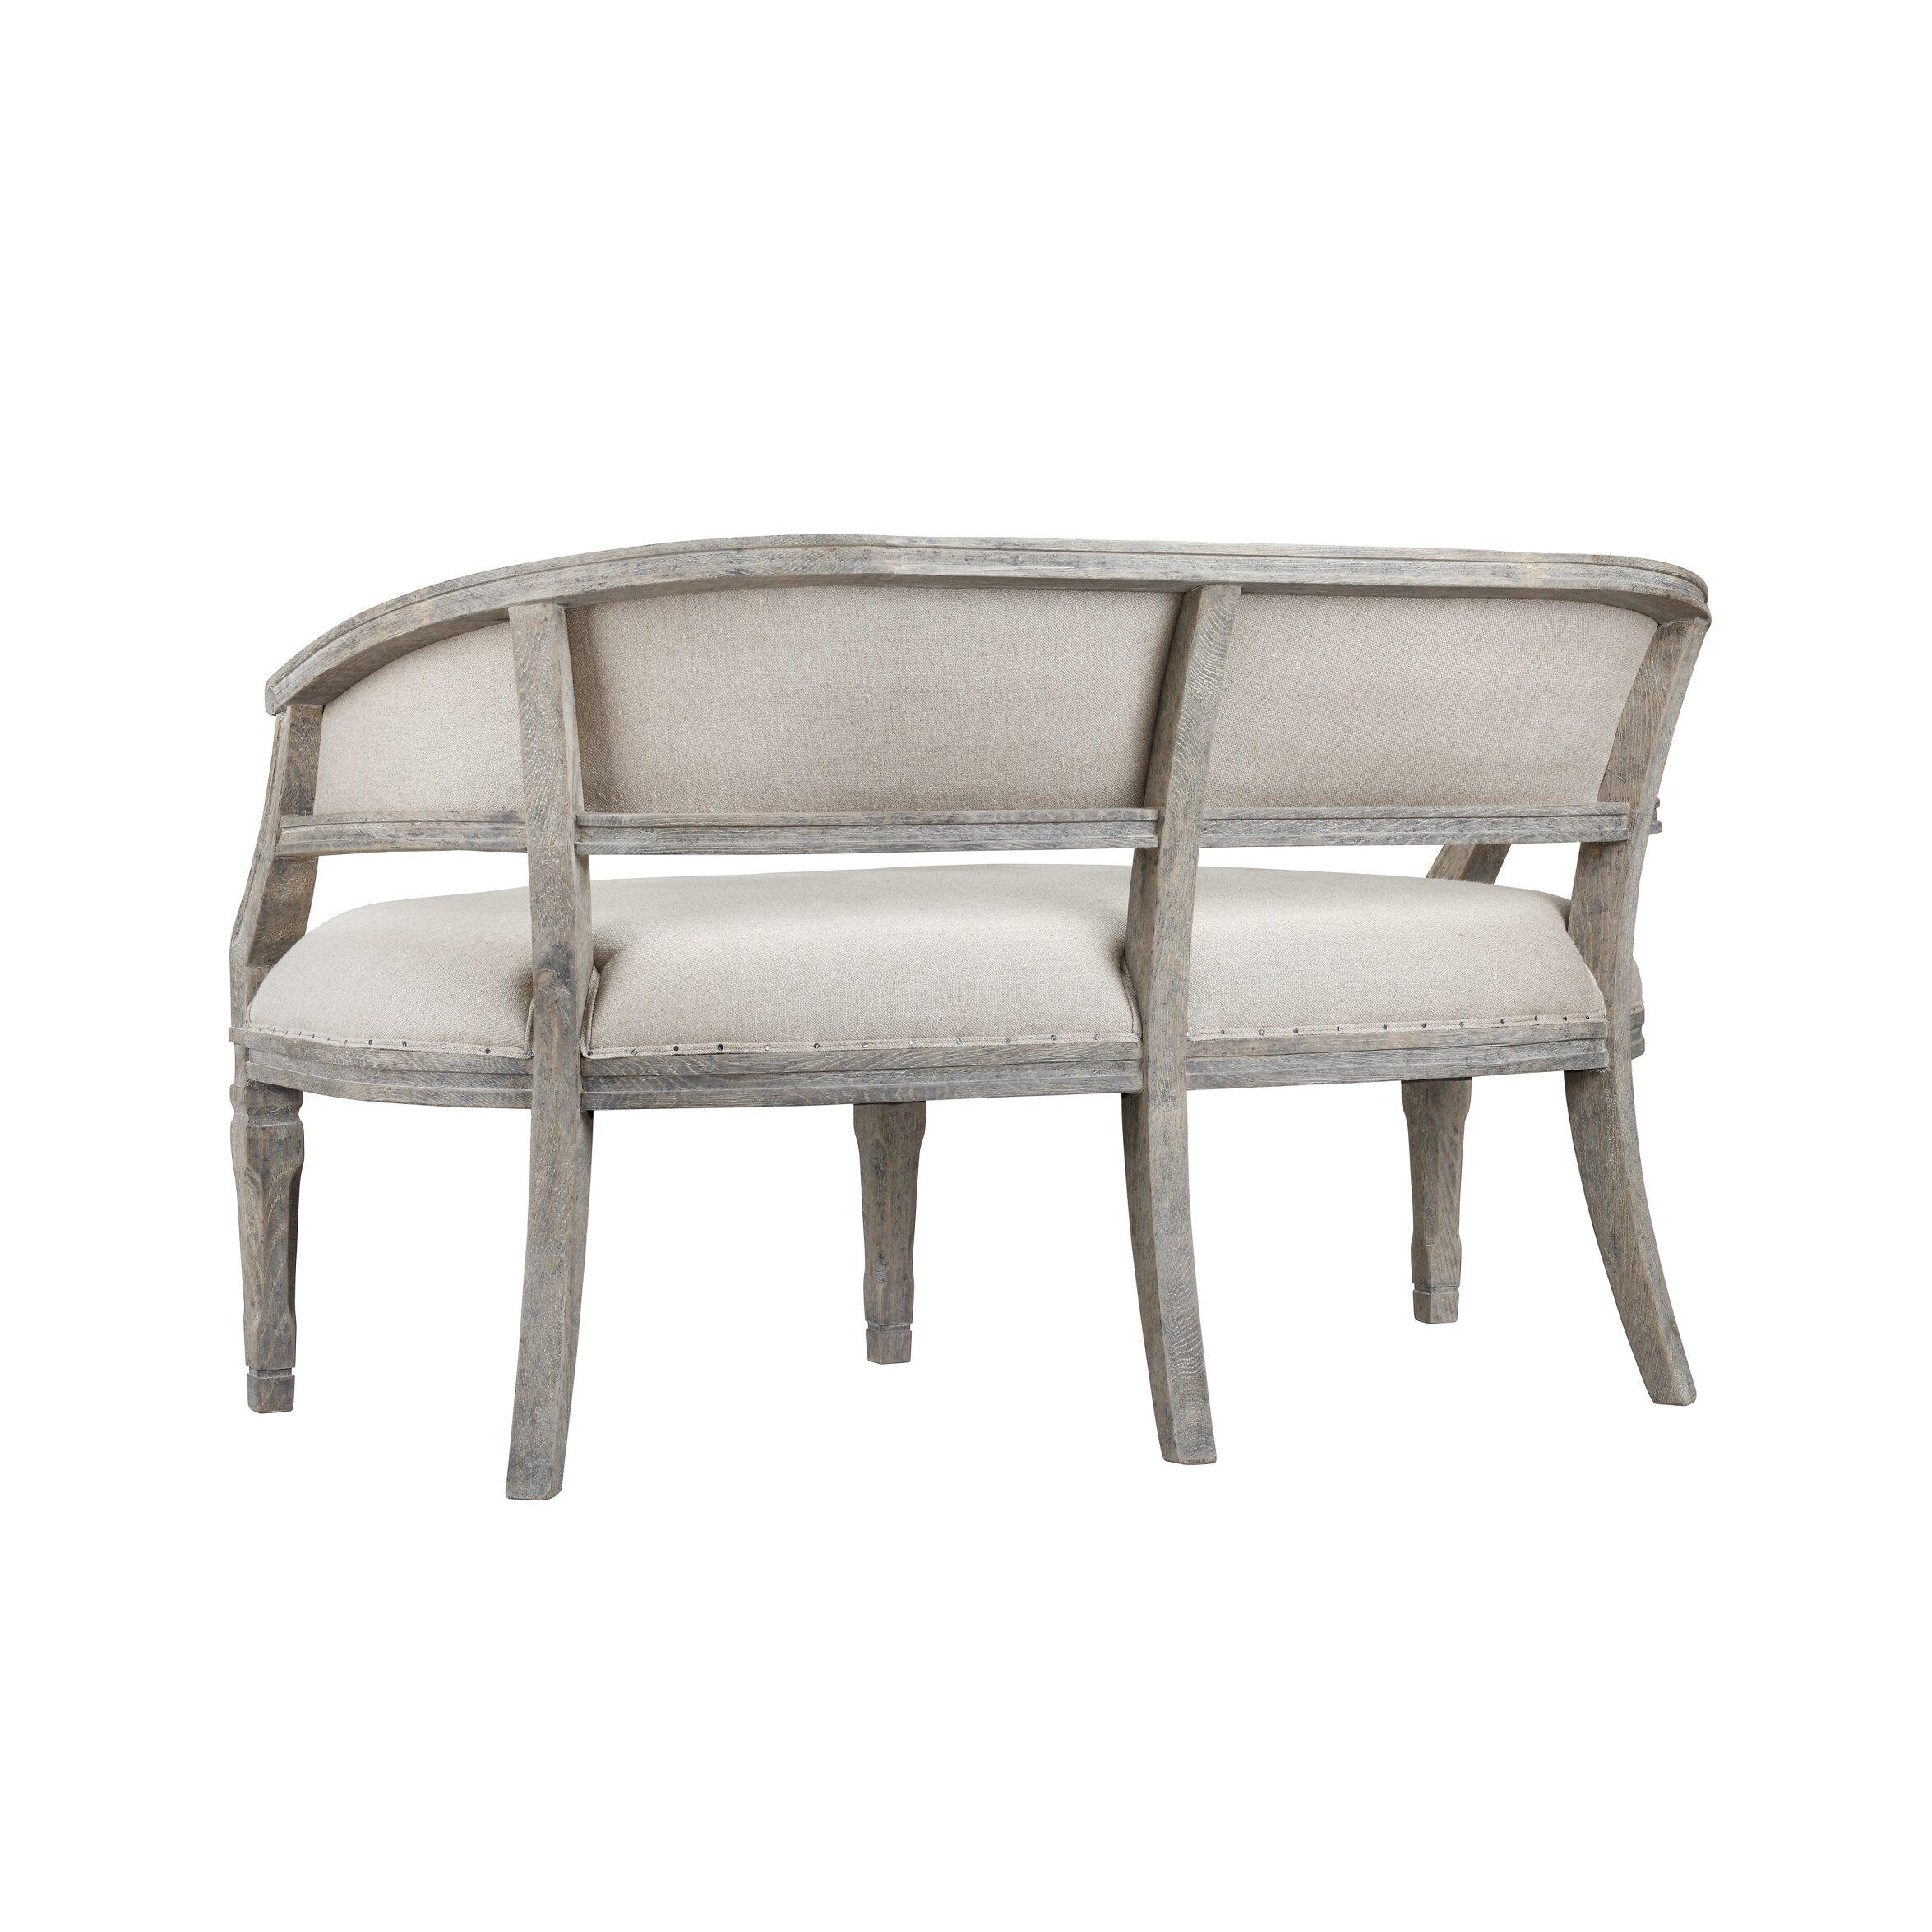 Upholstered Foyer Bench : Lark manor maily upholstered entryway bench wayfair